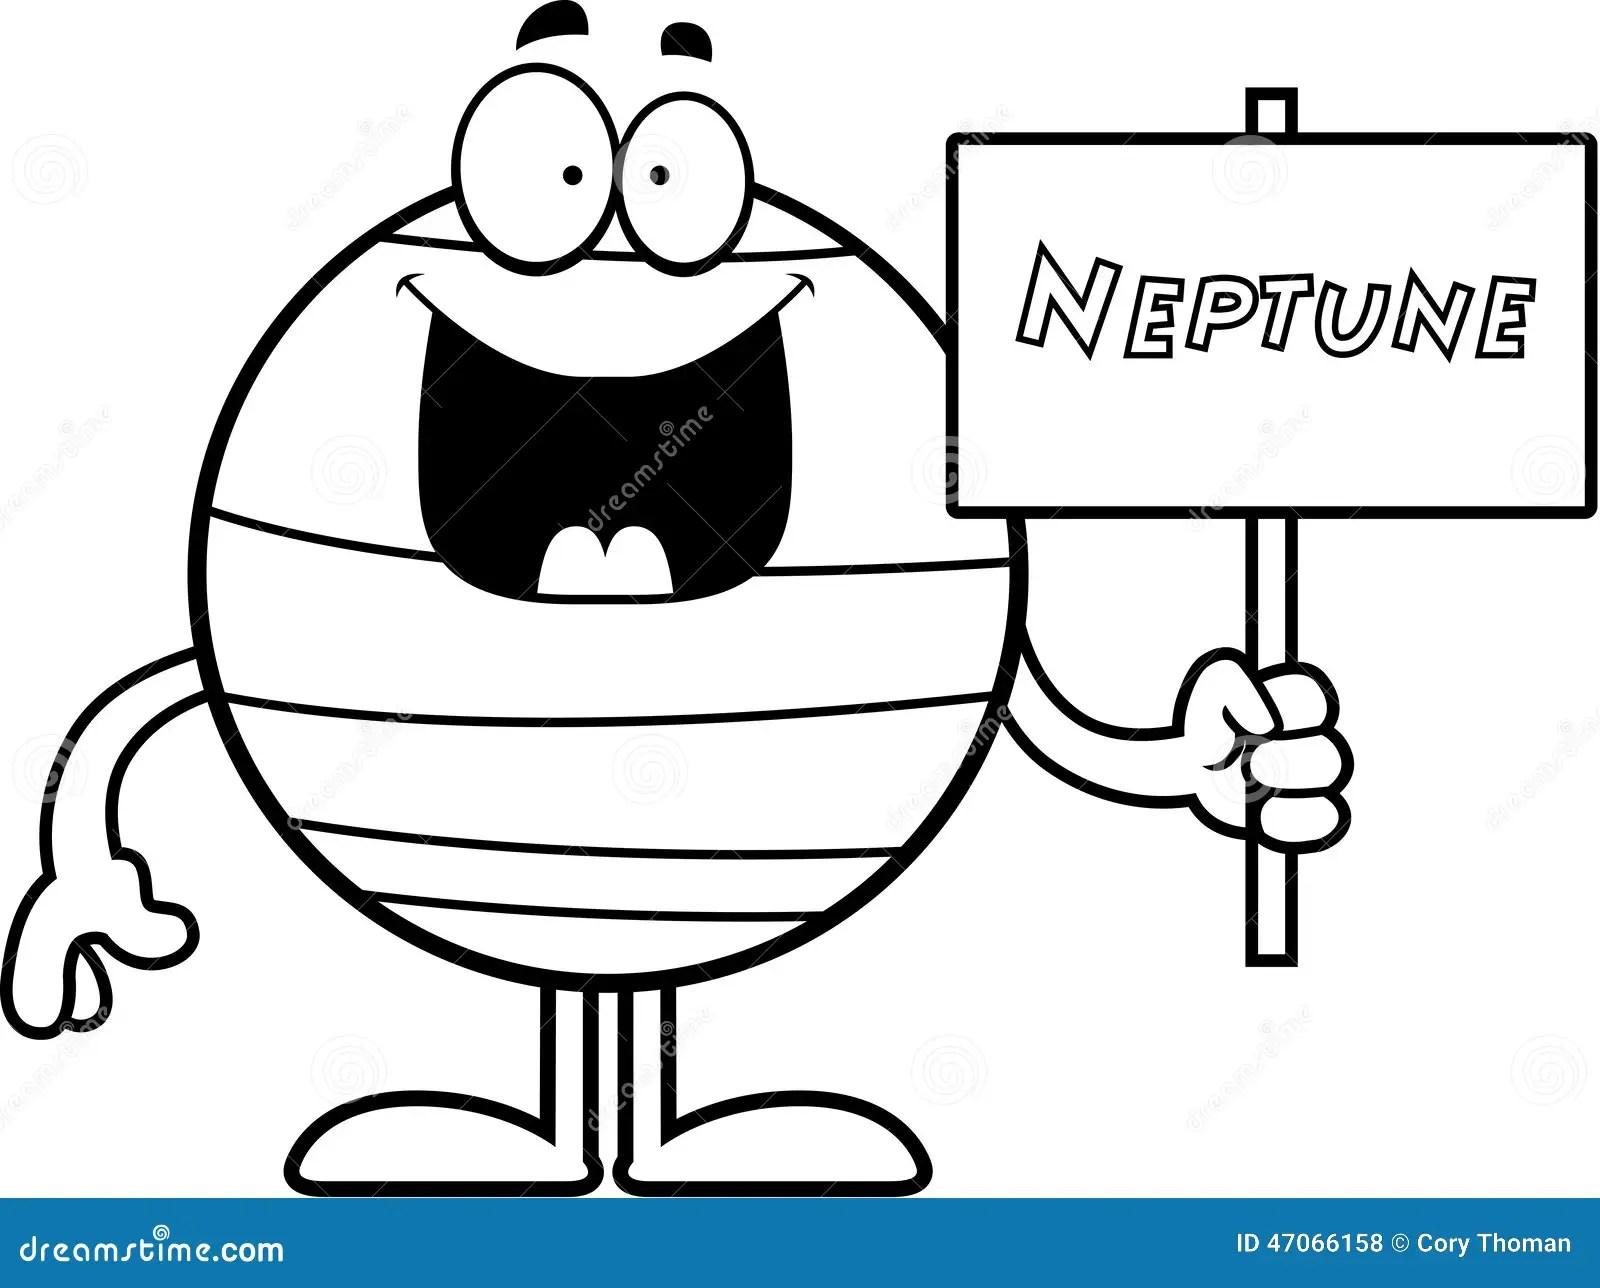 Cartoon Neptune Sign Stock Vector